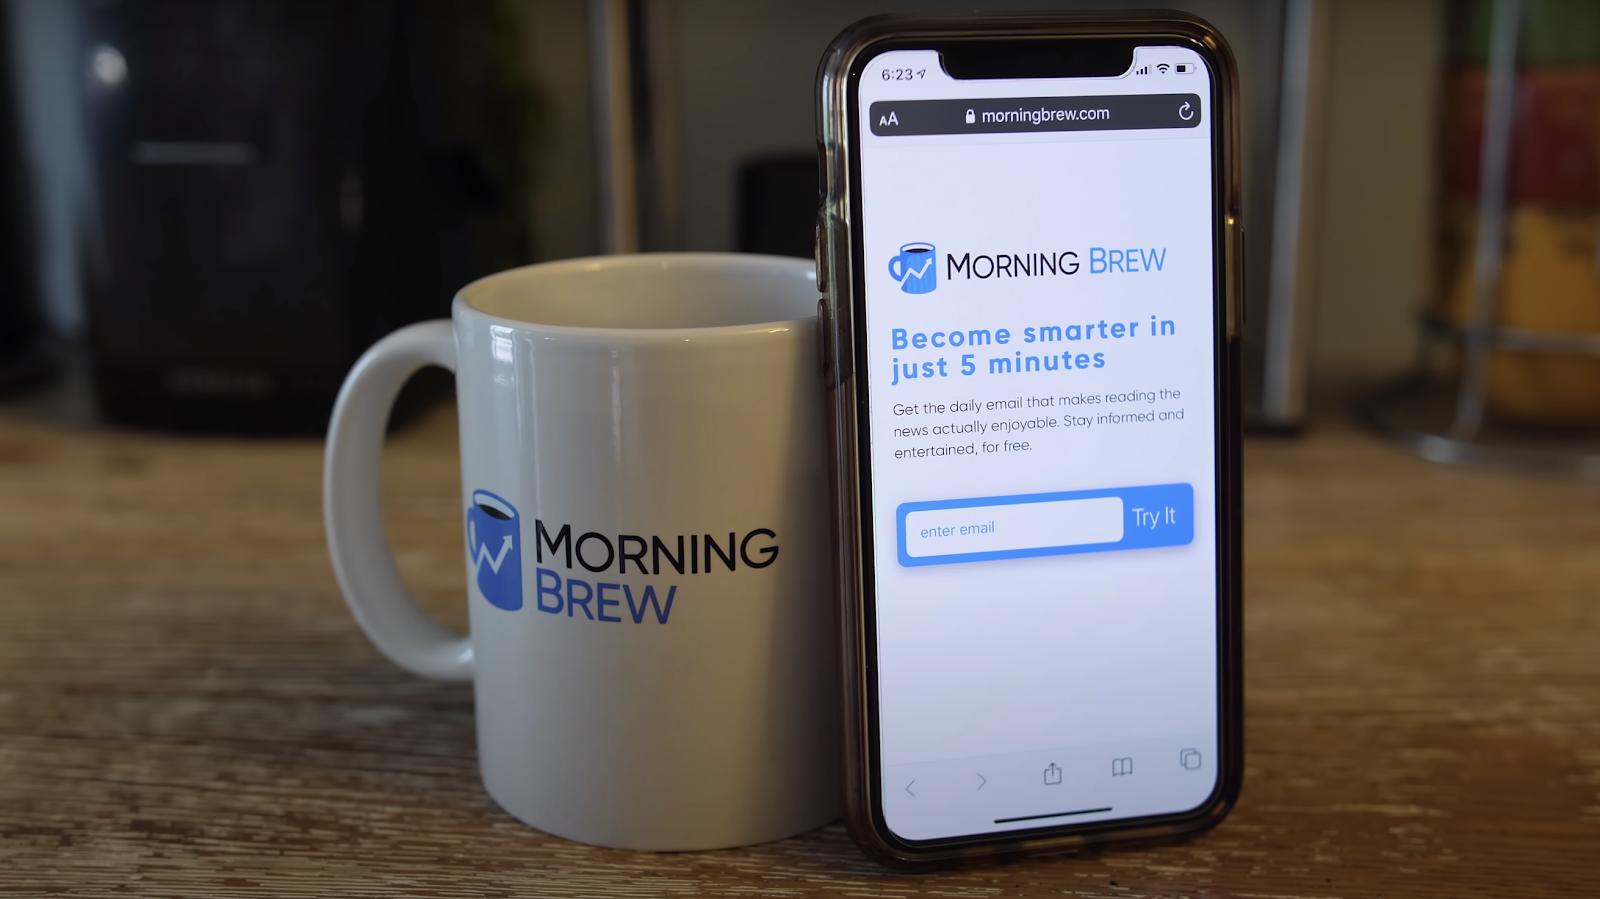 Coffee mug and phone